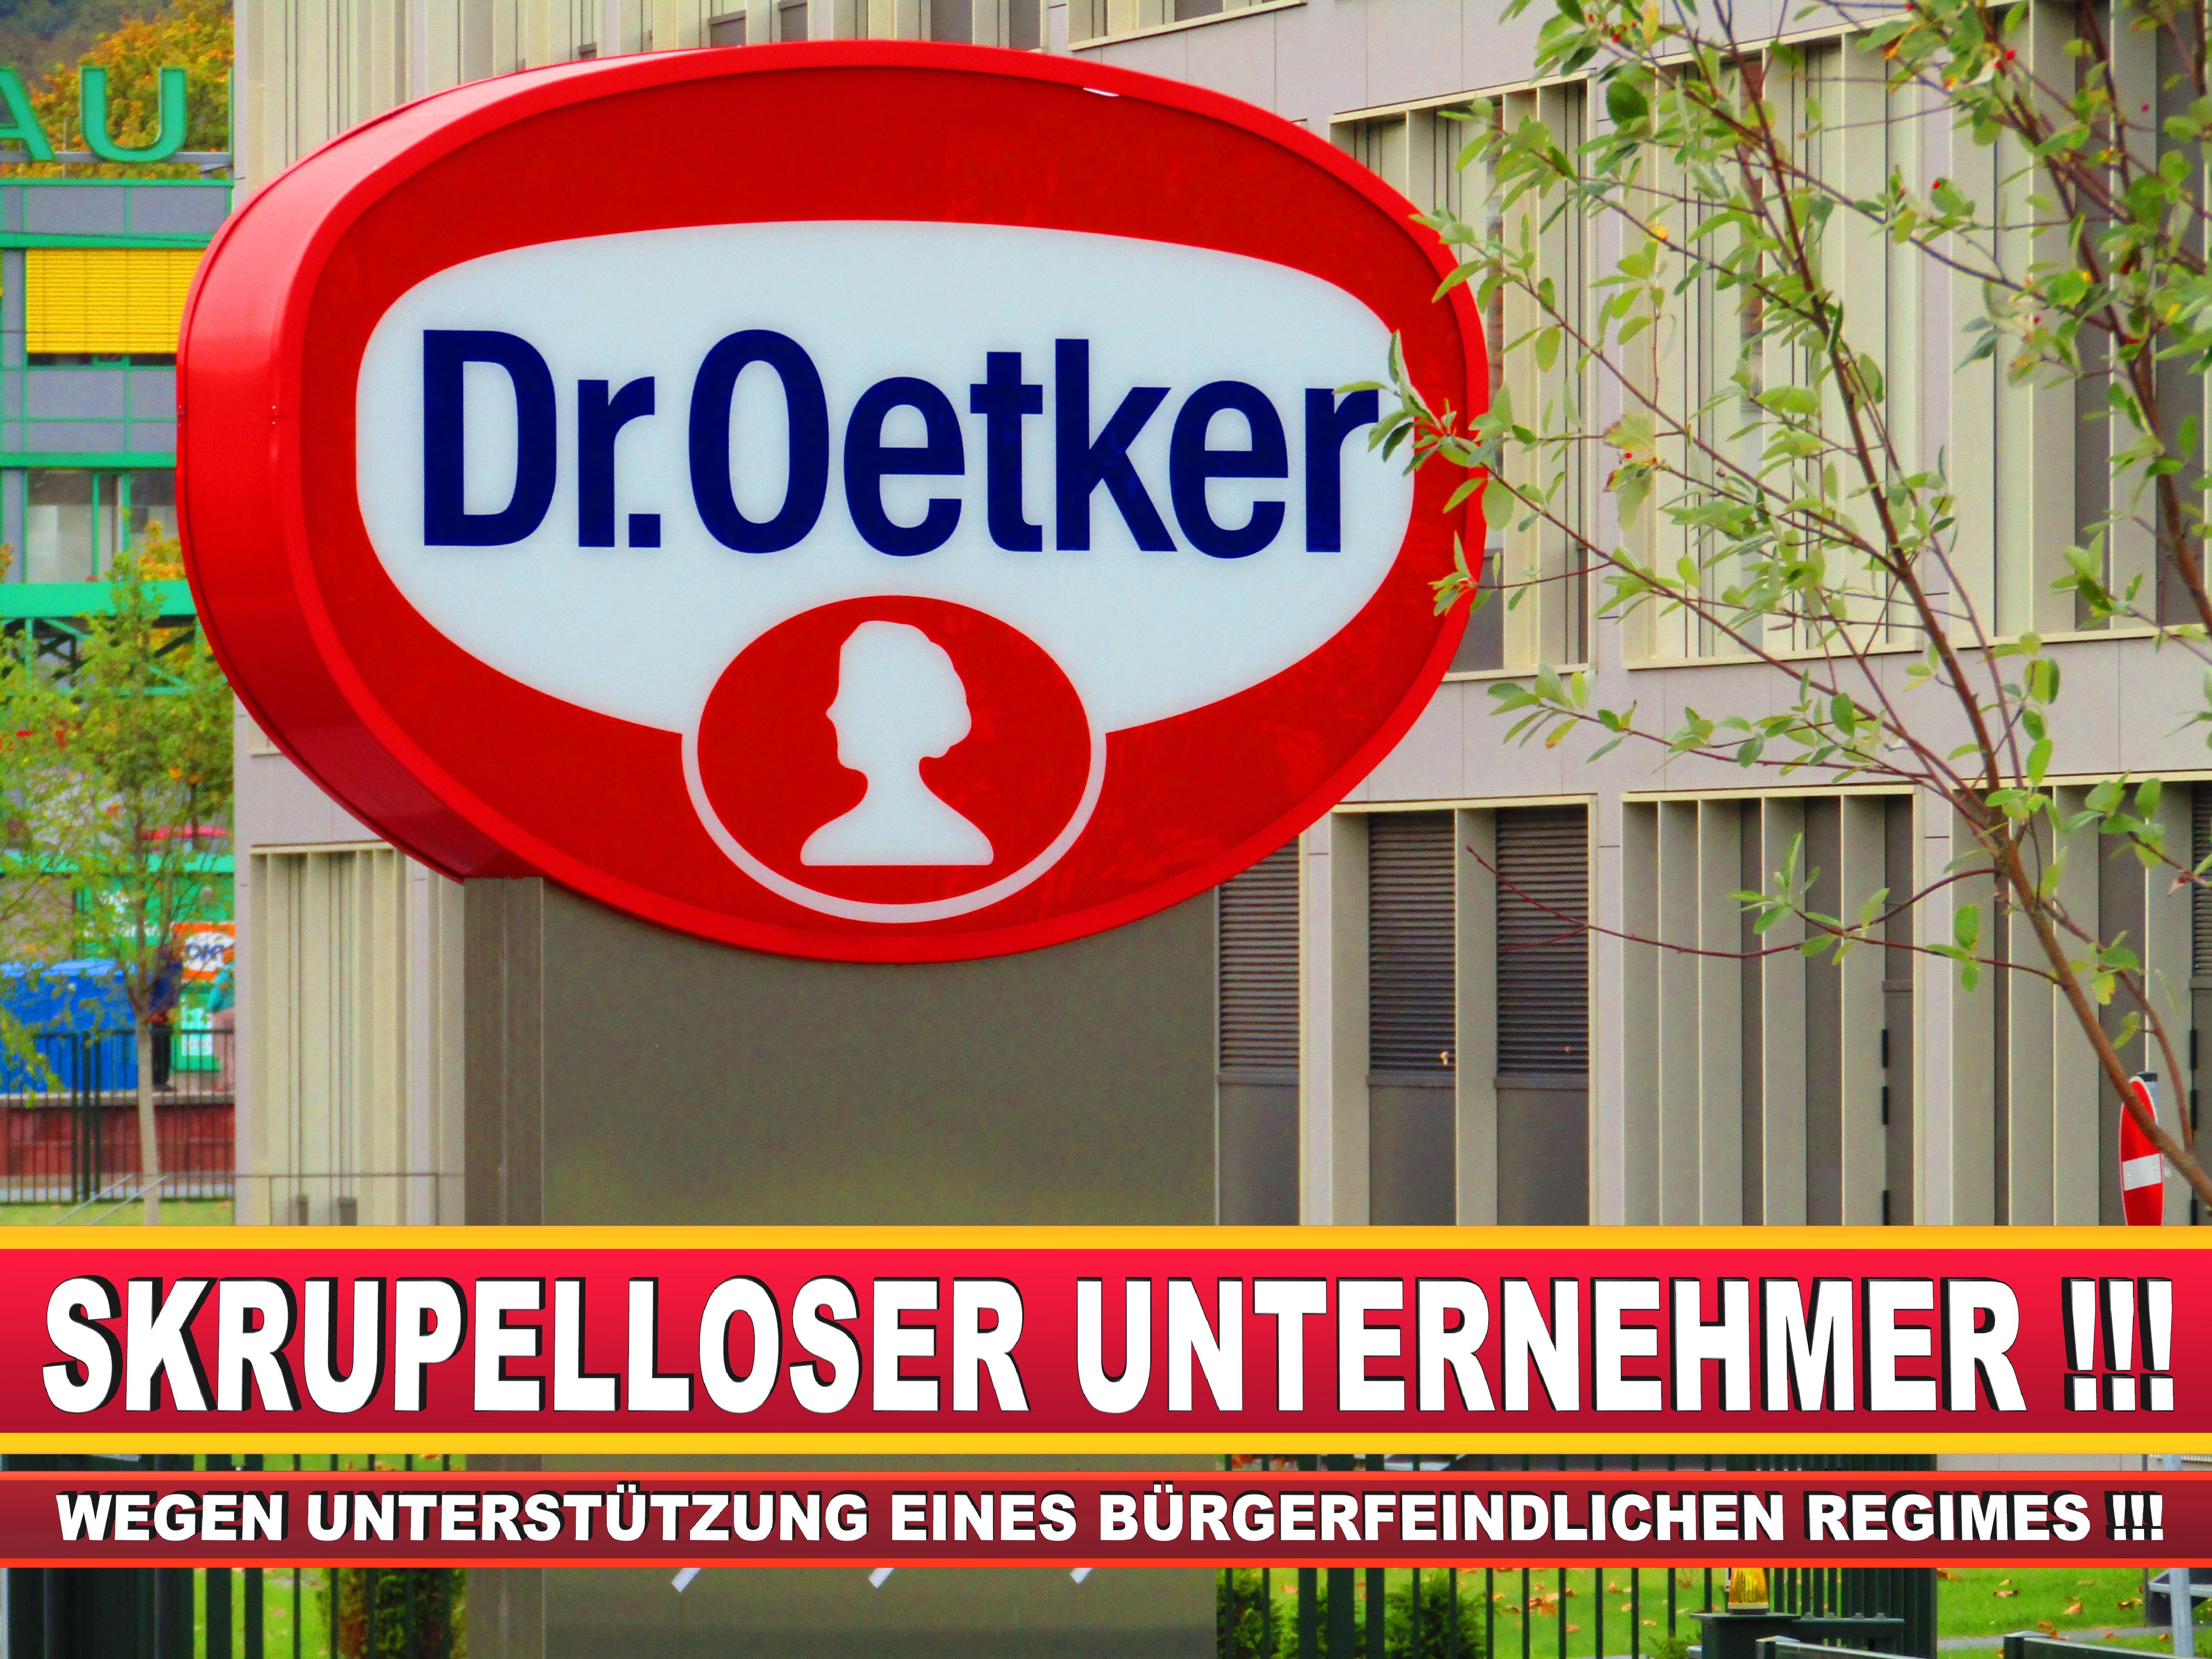 Dr Oetker Bielefeld CDU Bielefeld Spendengelder Skandal Richard August (31)